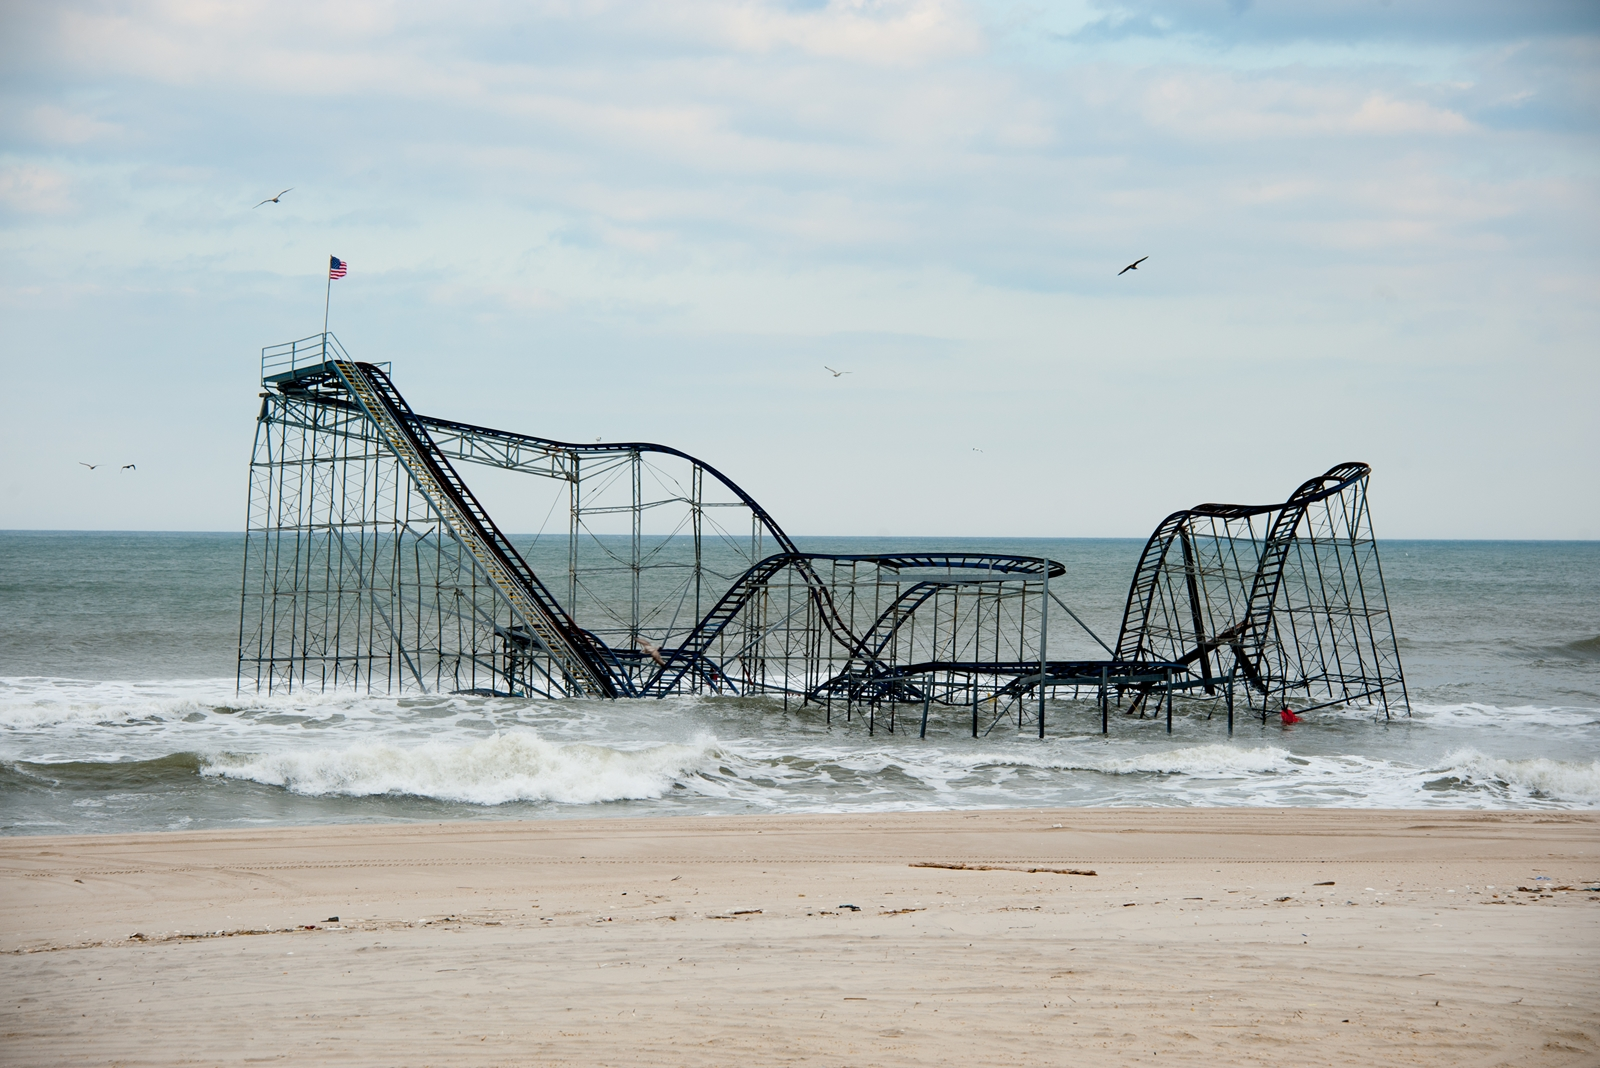 Seaside Heights Roller Coaster